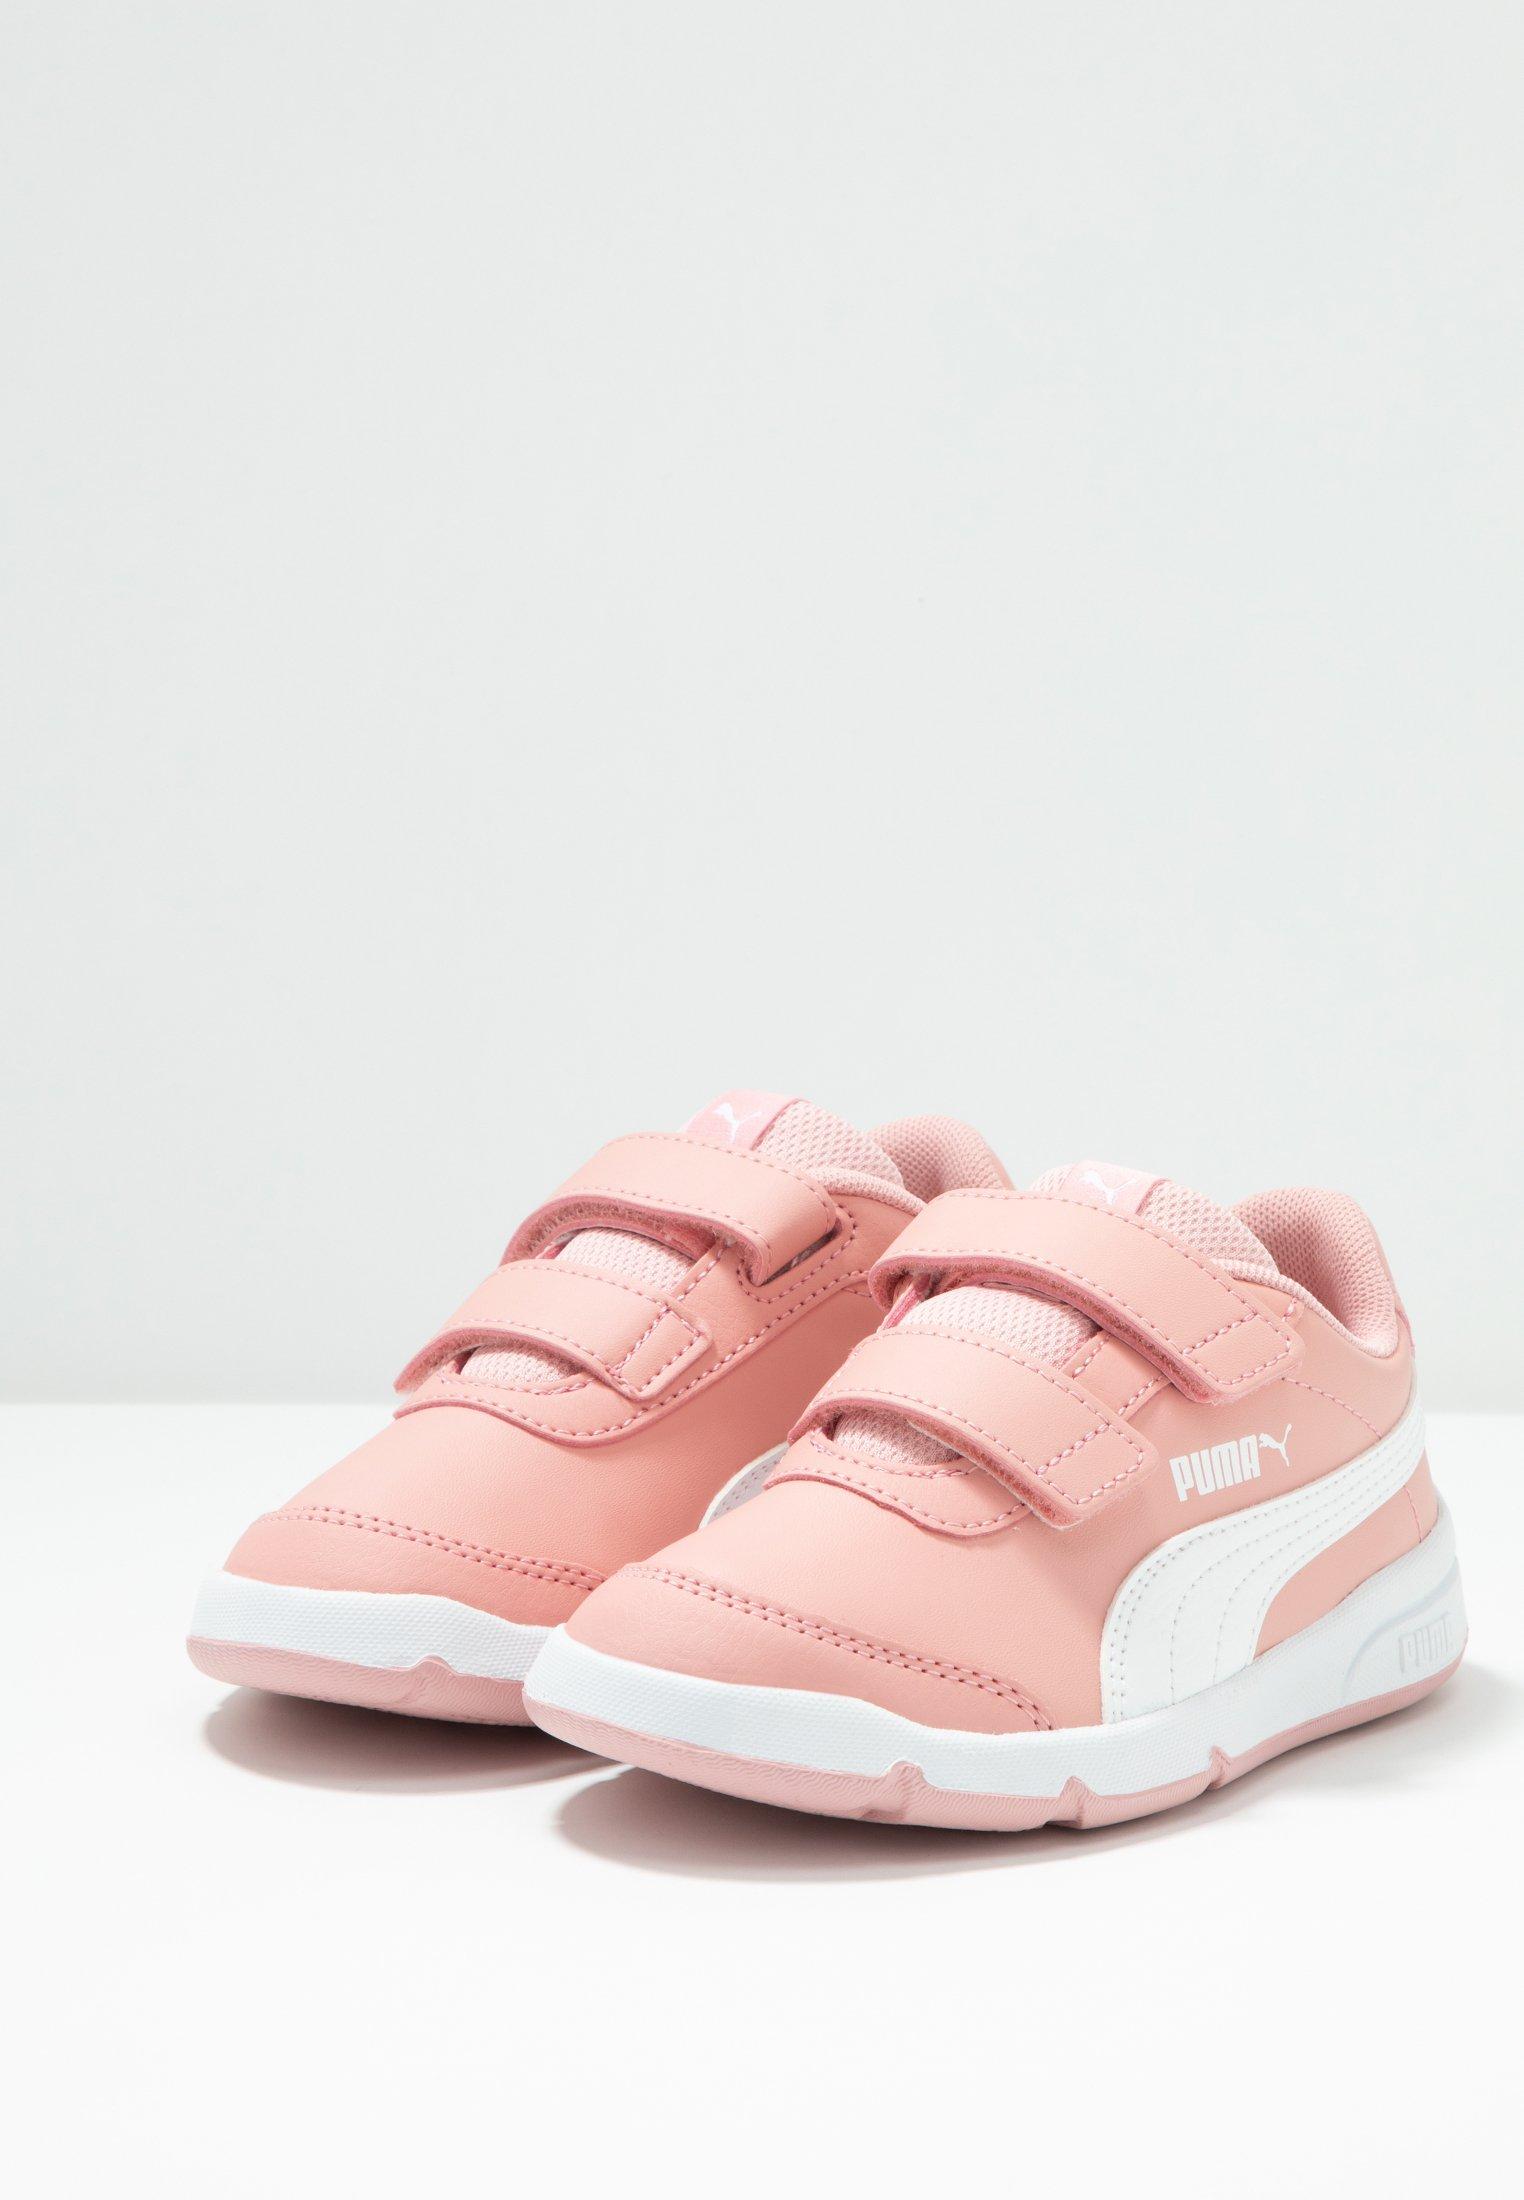 Puma STEPFLEEX 2 Sneakers laag bright rose Zalando.nl